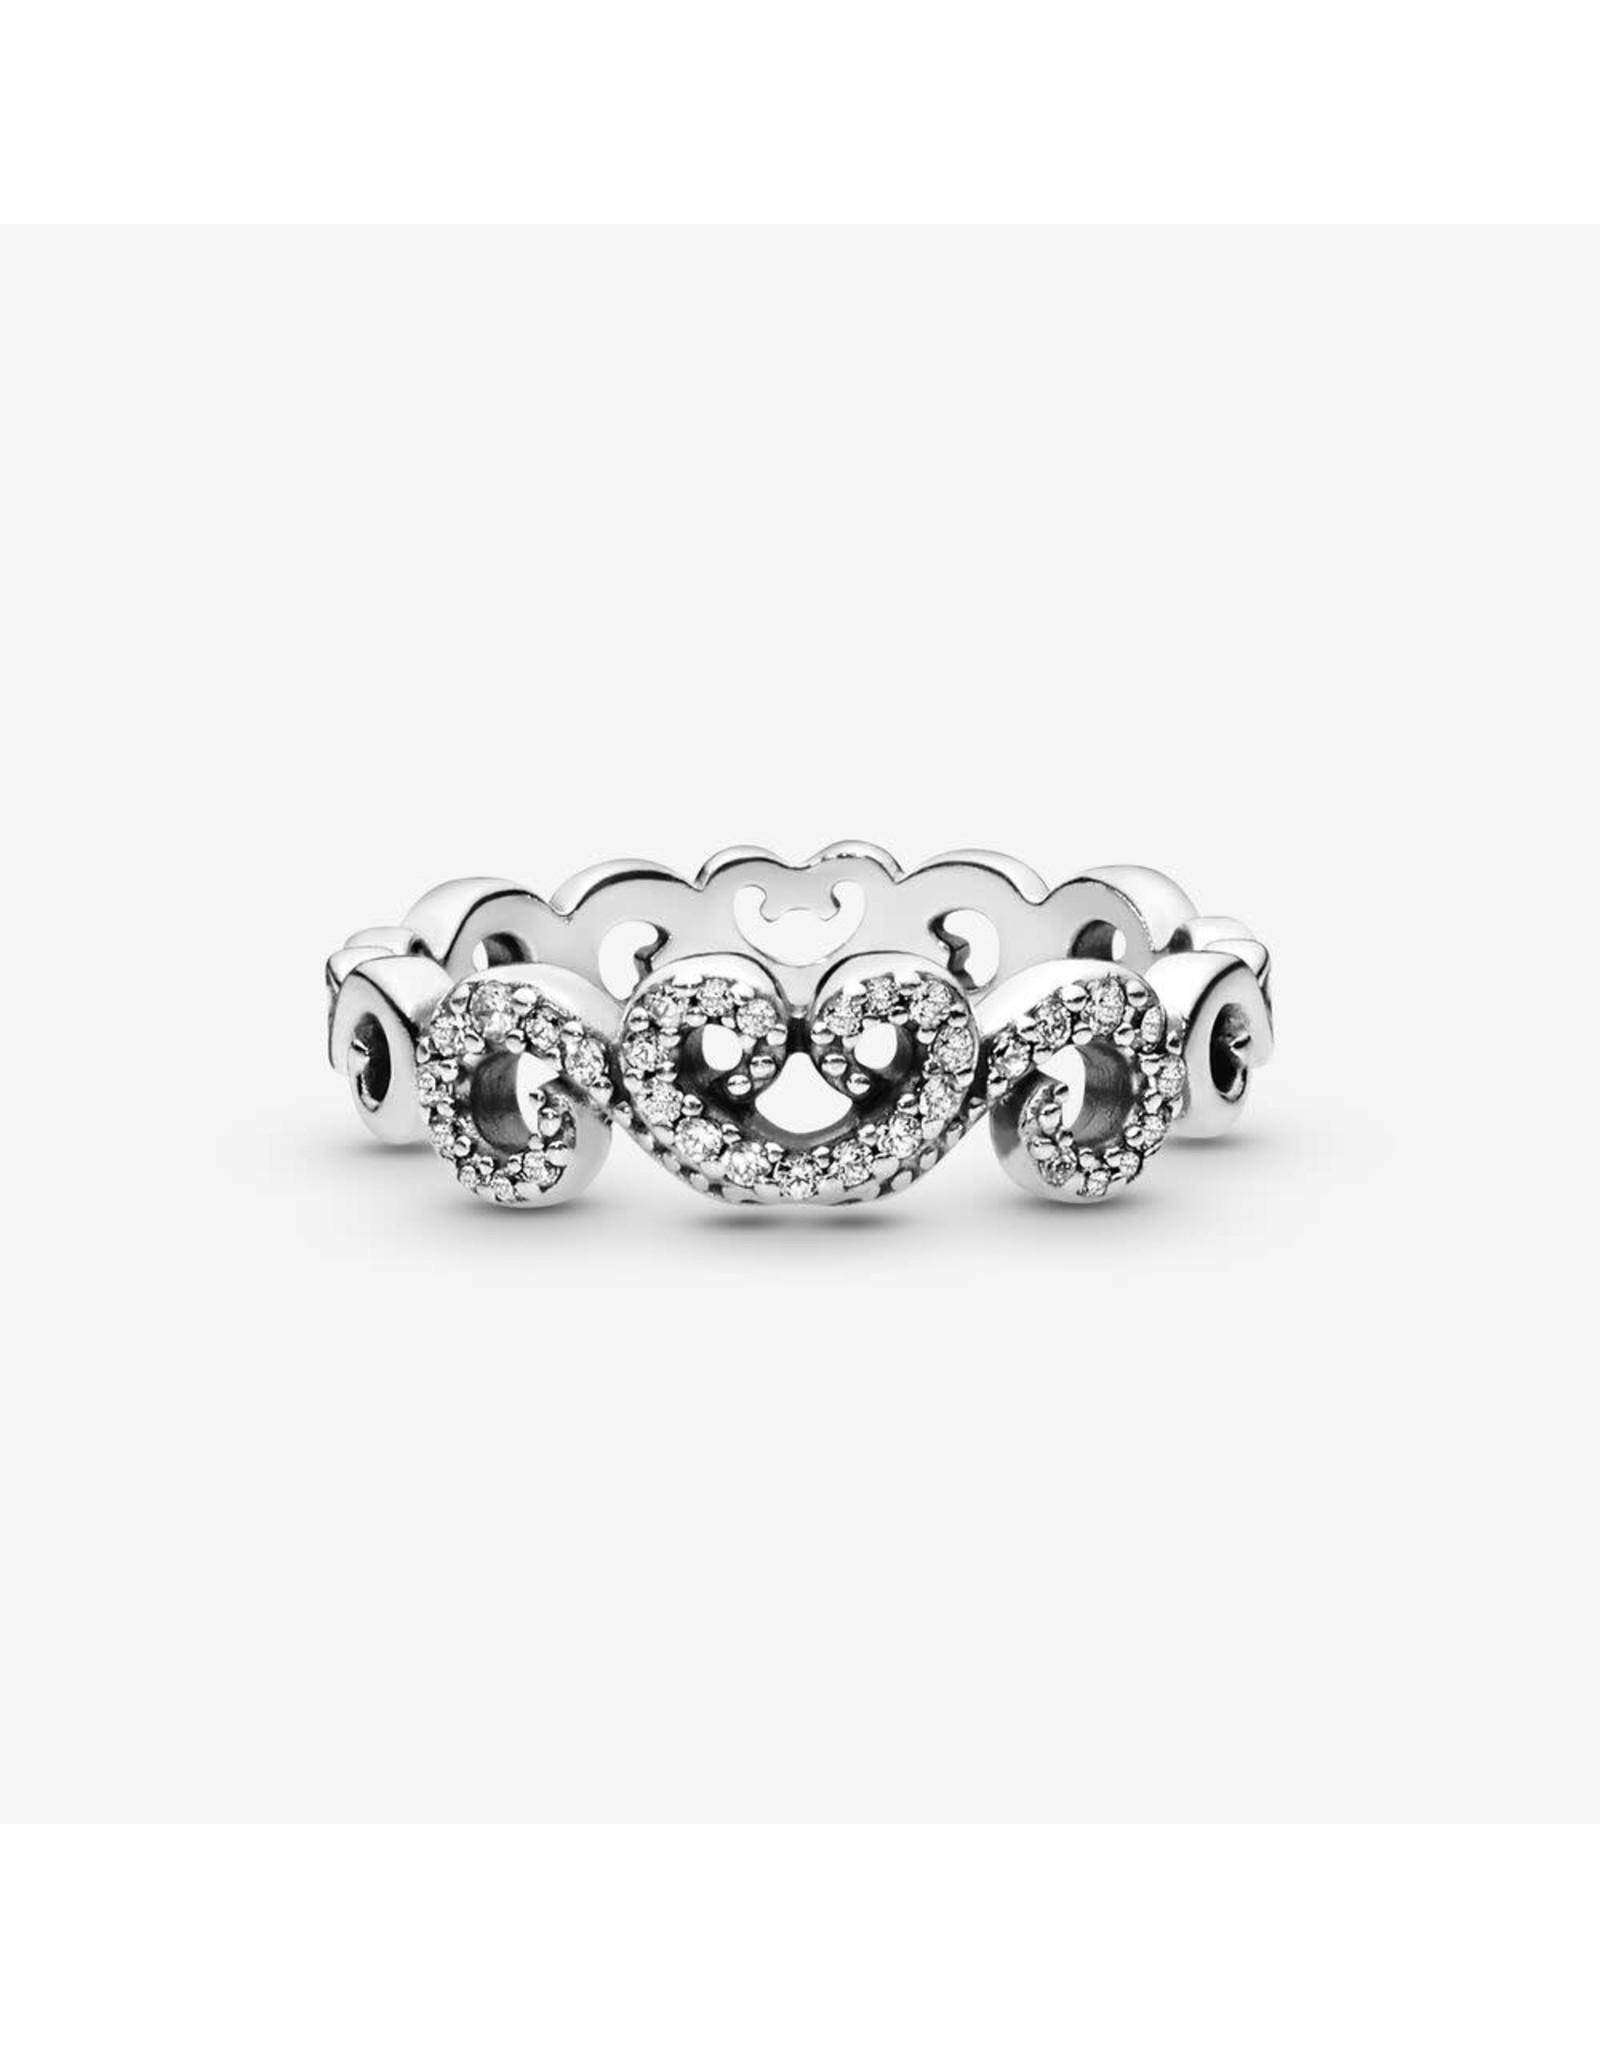 Pandora Pandora Ring,(197117CZ) Heart Swirls,Clear CZ